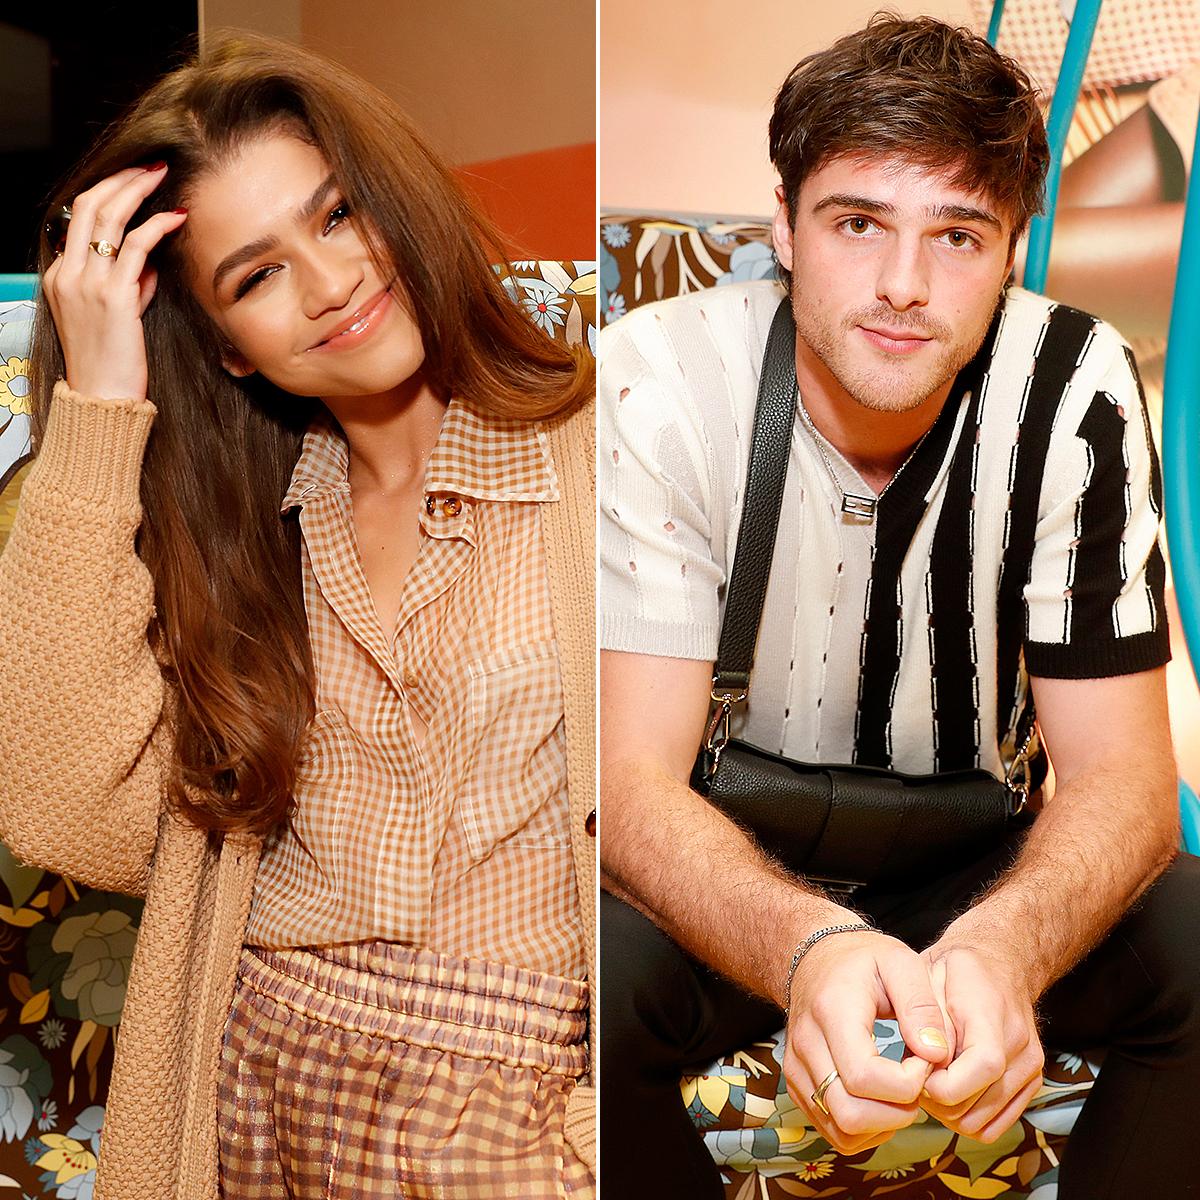 Zendaya-and-Jacob-Elordi-dating